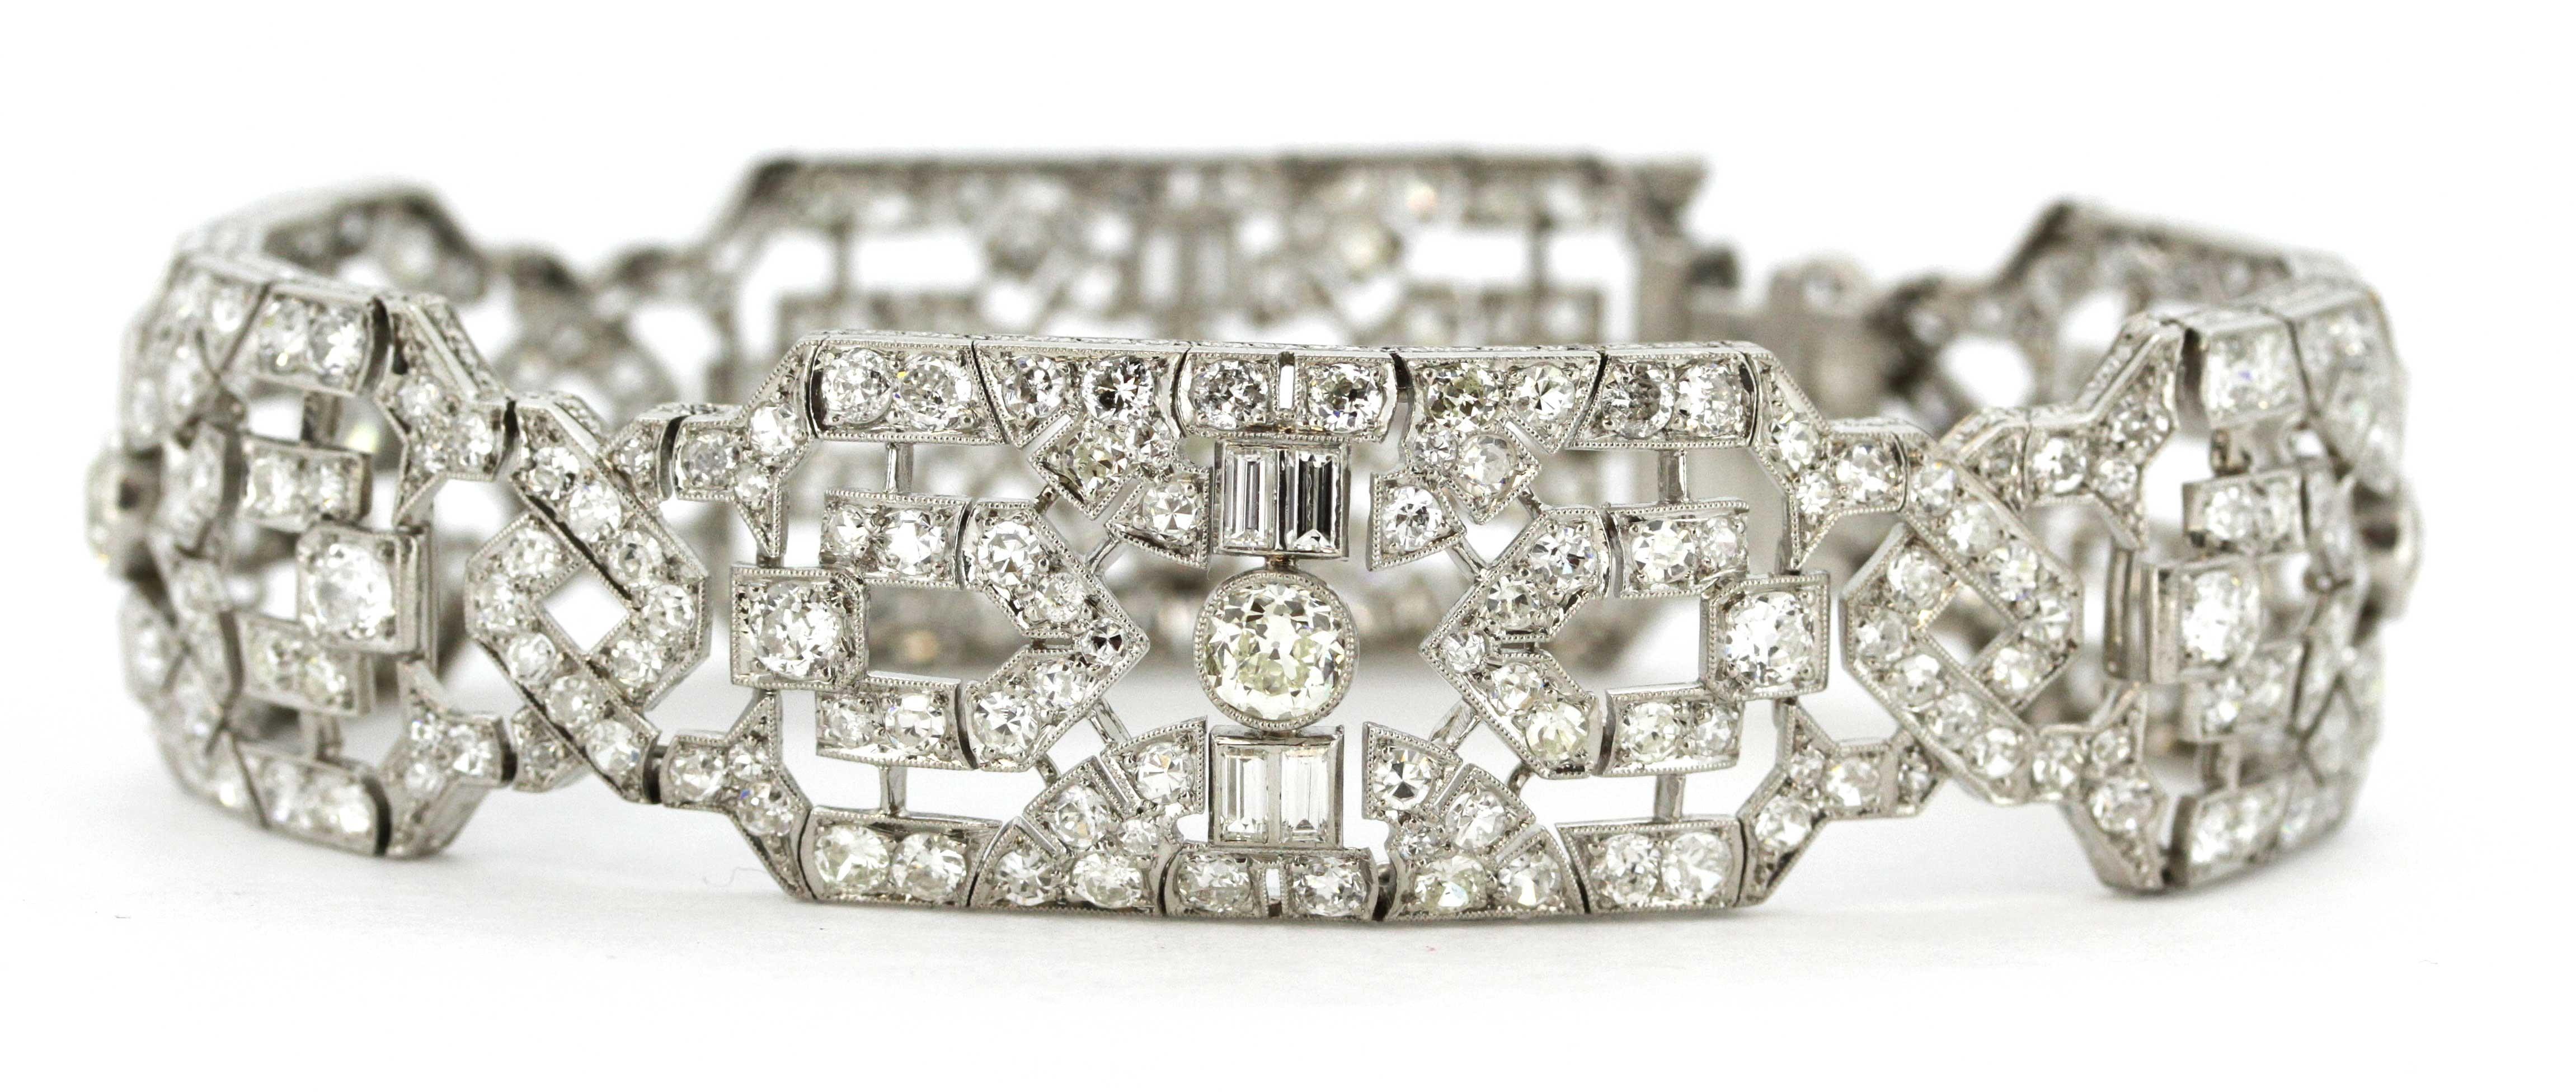 Art Deco style platinum bracelet